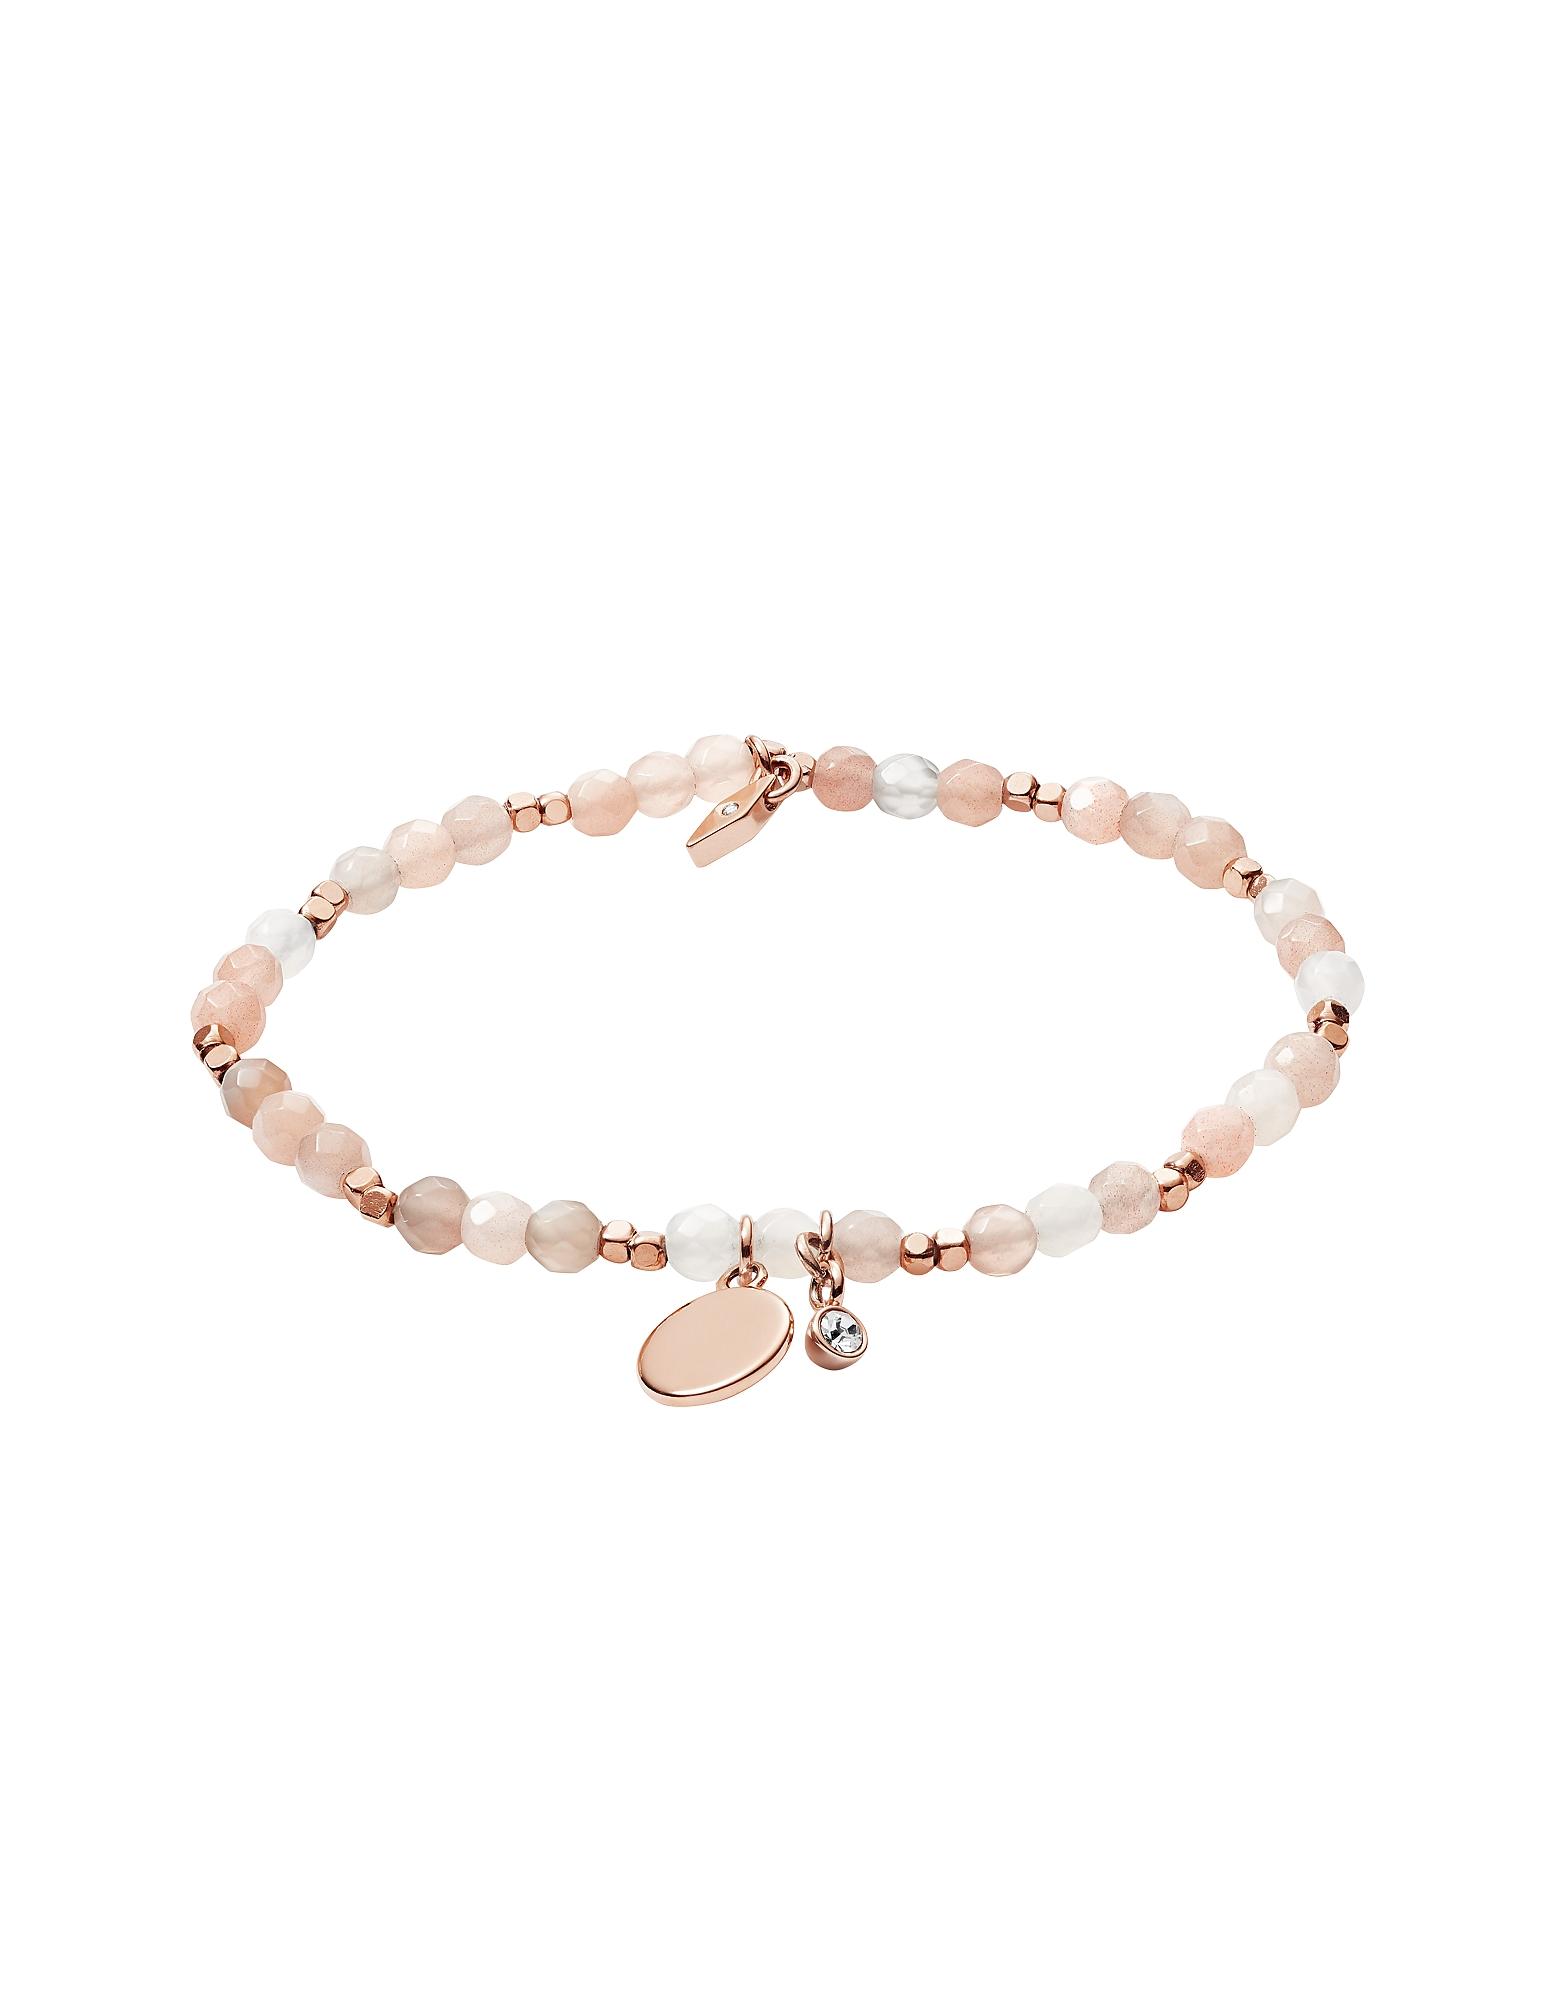 Fossil Bracelets, Women's Moonstone Bracelet